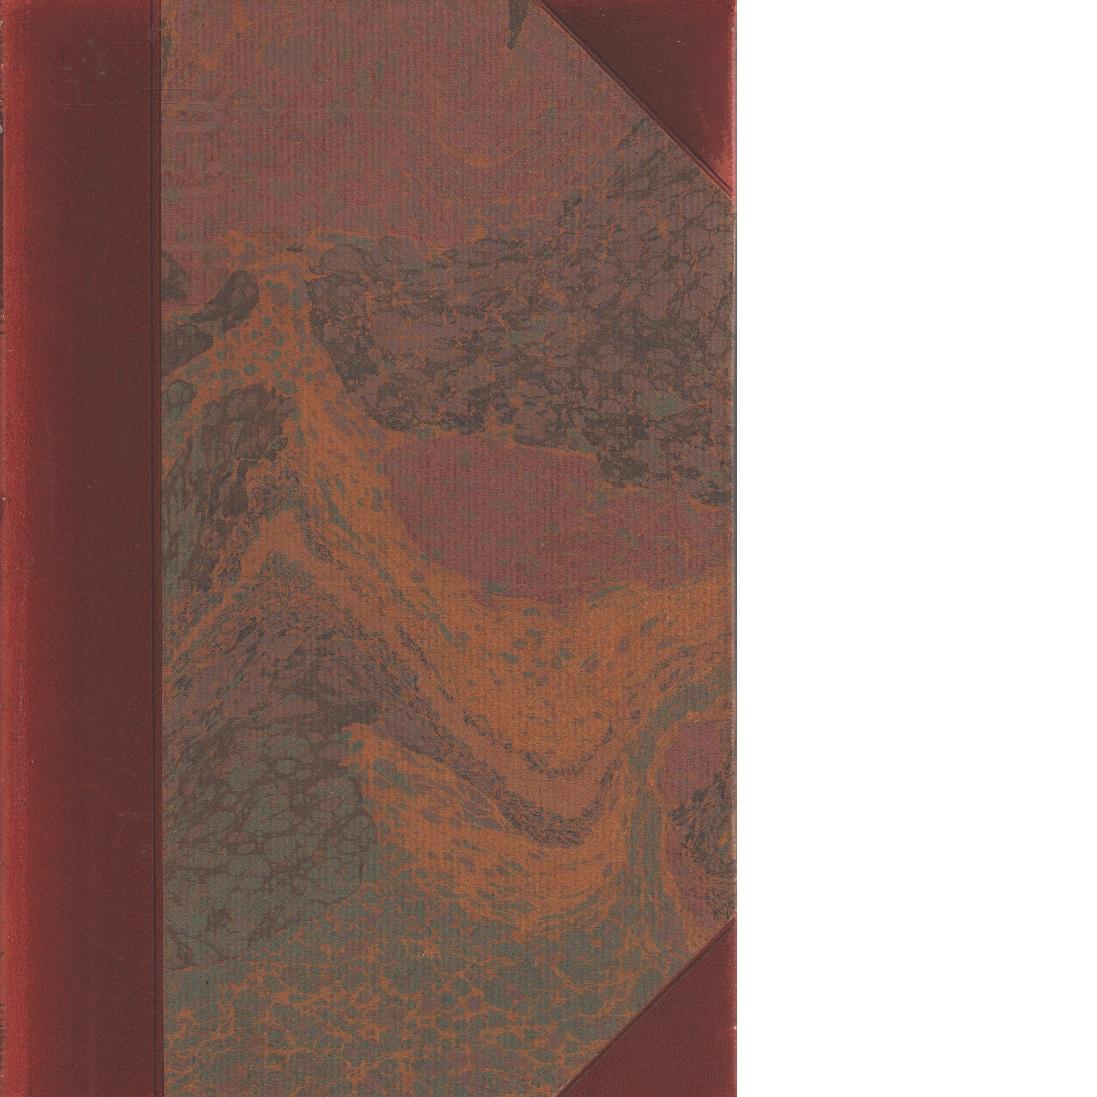 Samlade dikter. Bd 1 - 5 - Snoilsky, Carl